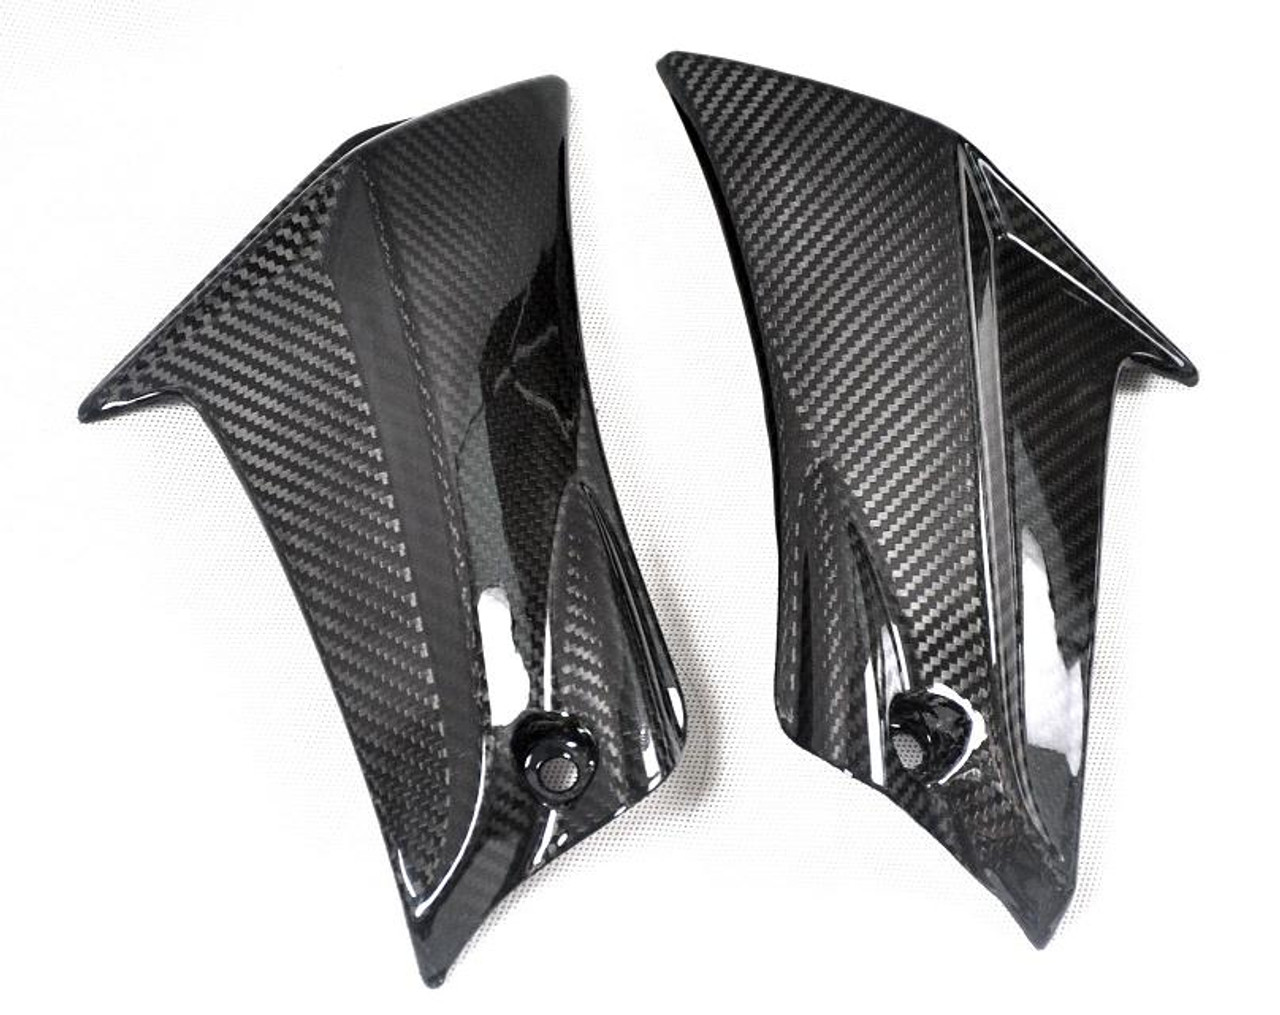 Glossy Twill Weave Carbon Fiber Knee Side Fairings for Suzuki GSXR 600, GSXR 750  2011-2019